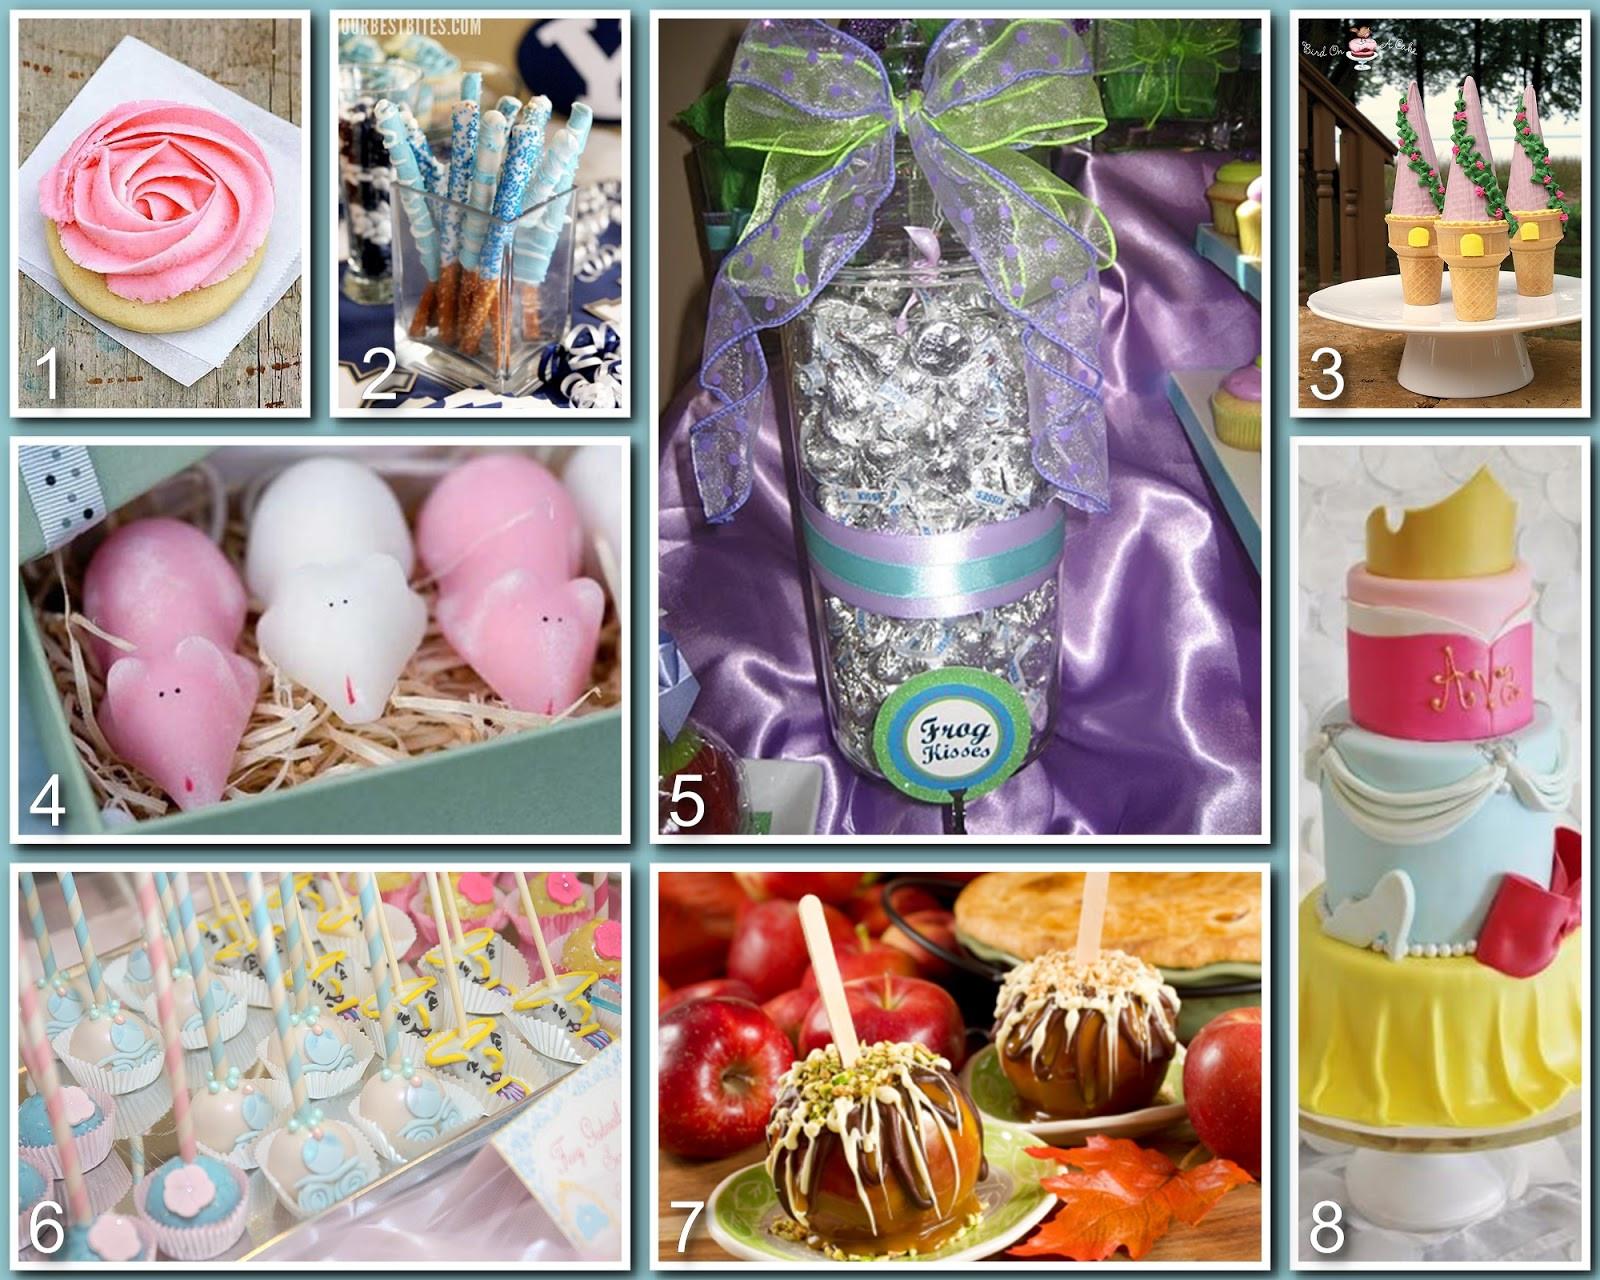 Disney Princess Party Food Ideas  Disney Donna Kay Disney Party Boards Disney Princess